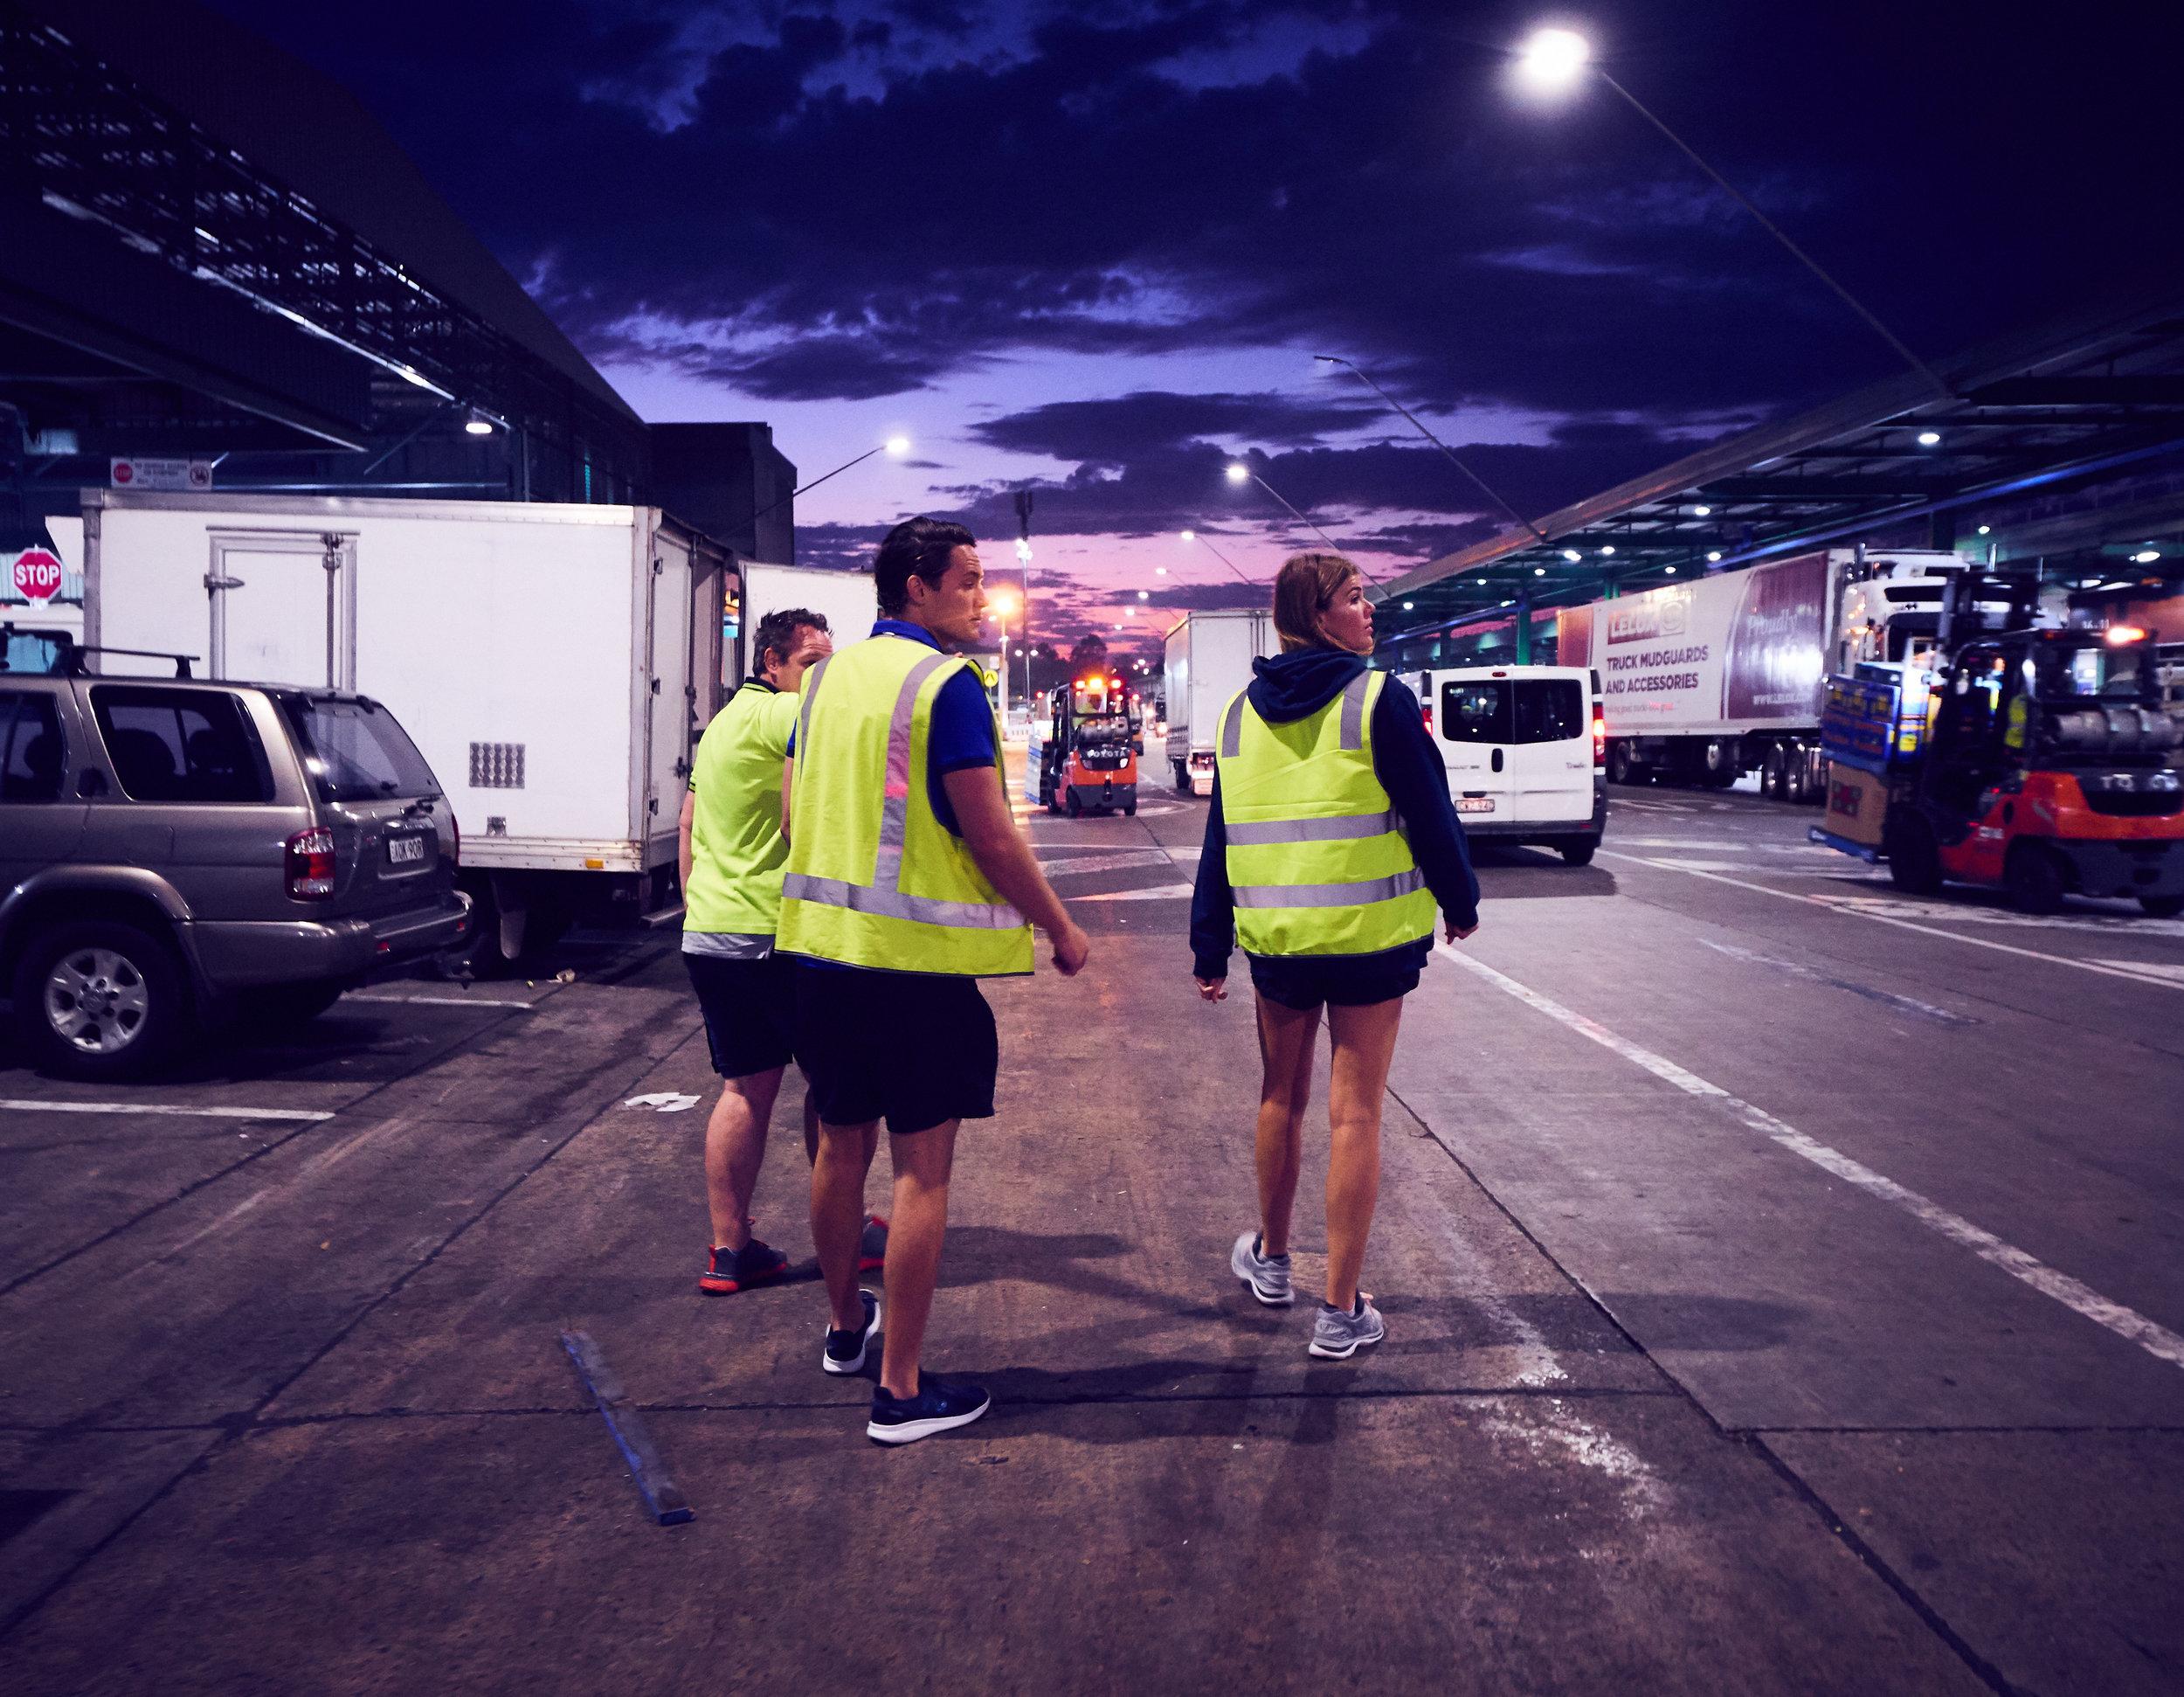 NSWIS APRIL IMAGES 5.jpg